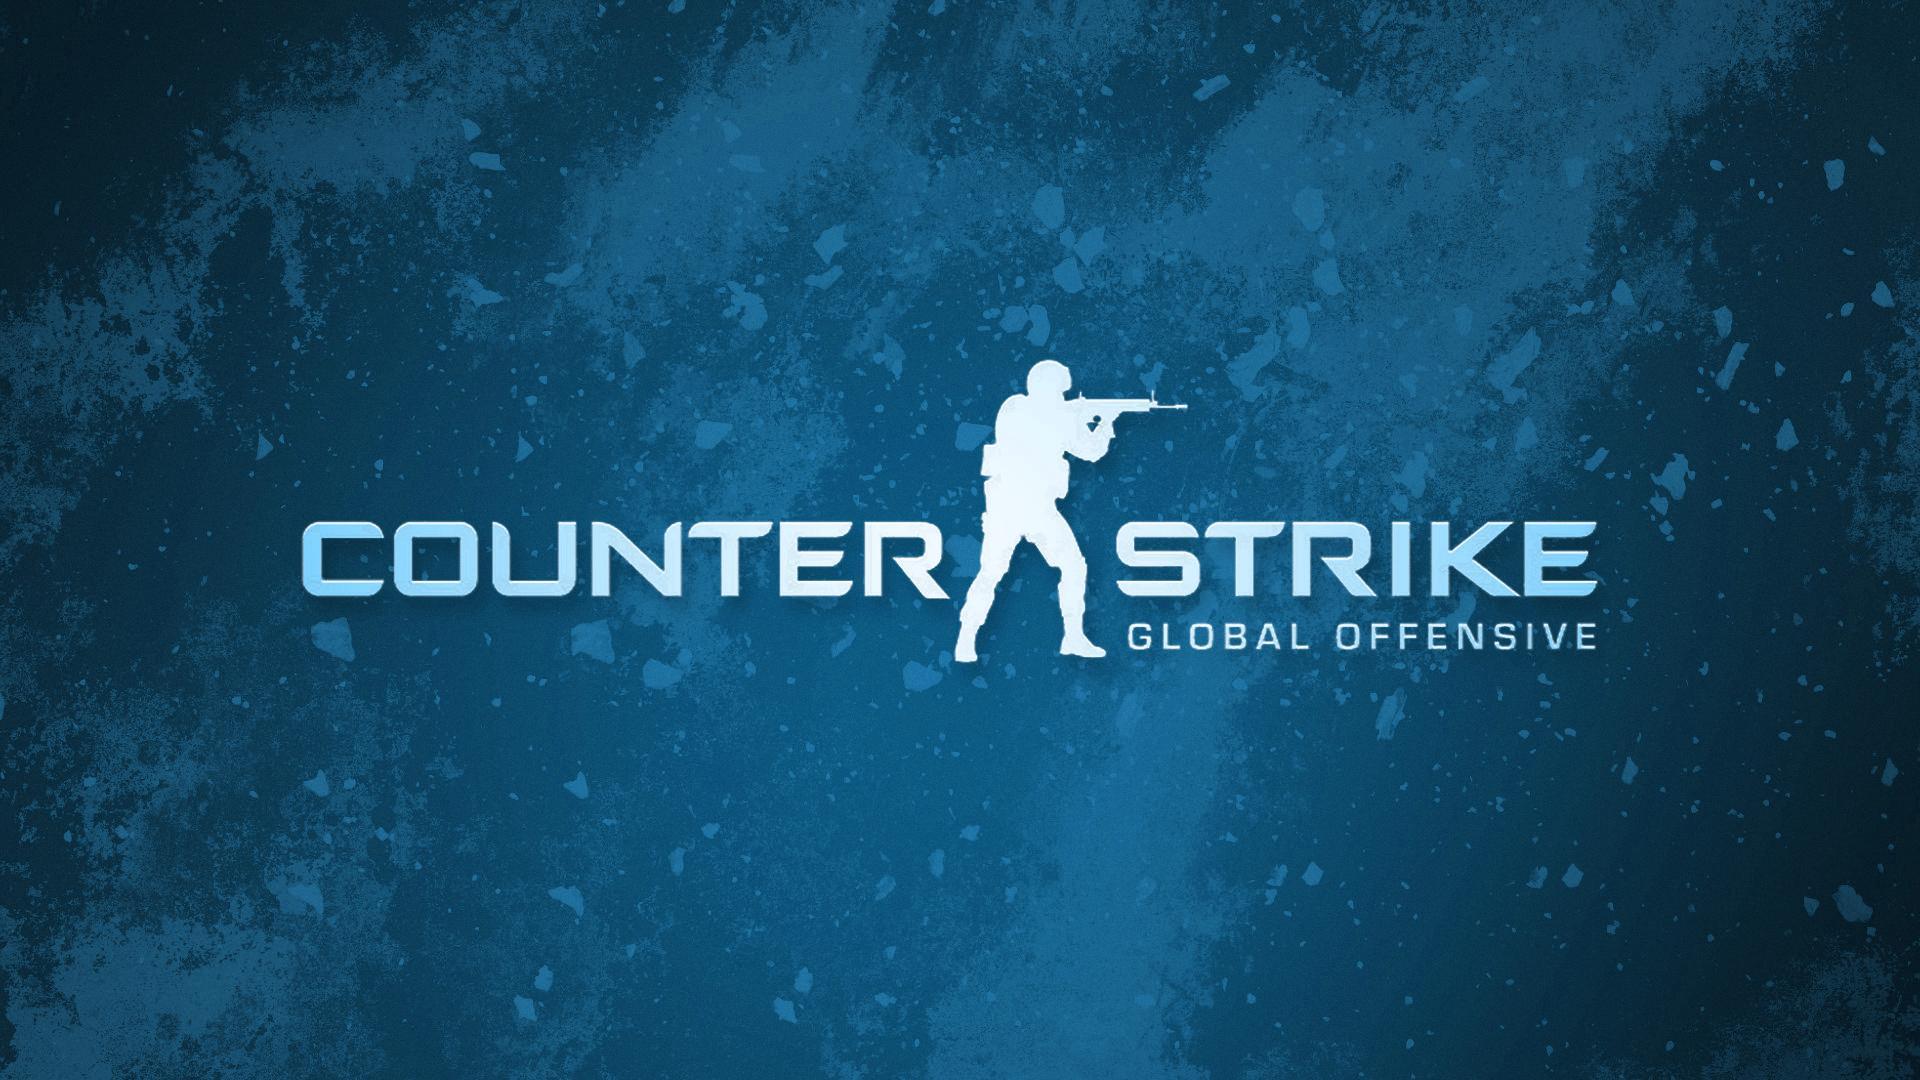 Counter Strike Global Offensive Wallpaper Hintergrundbild HQ 2014 1920x1080